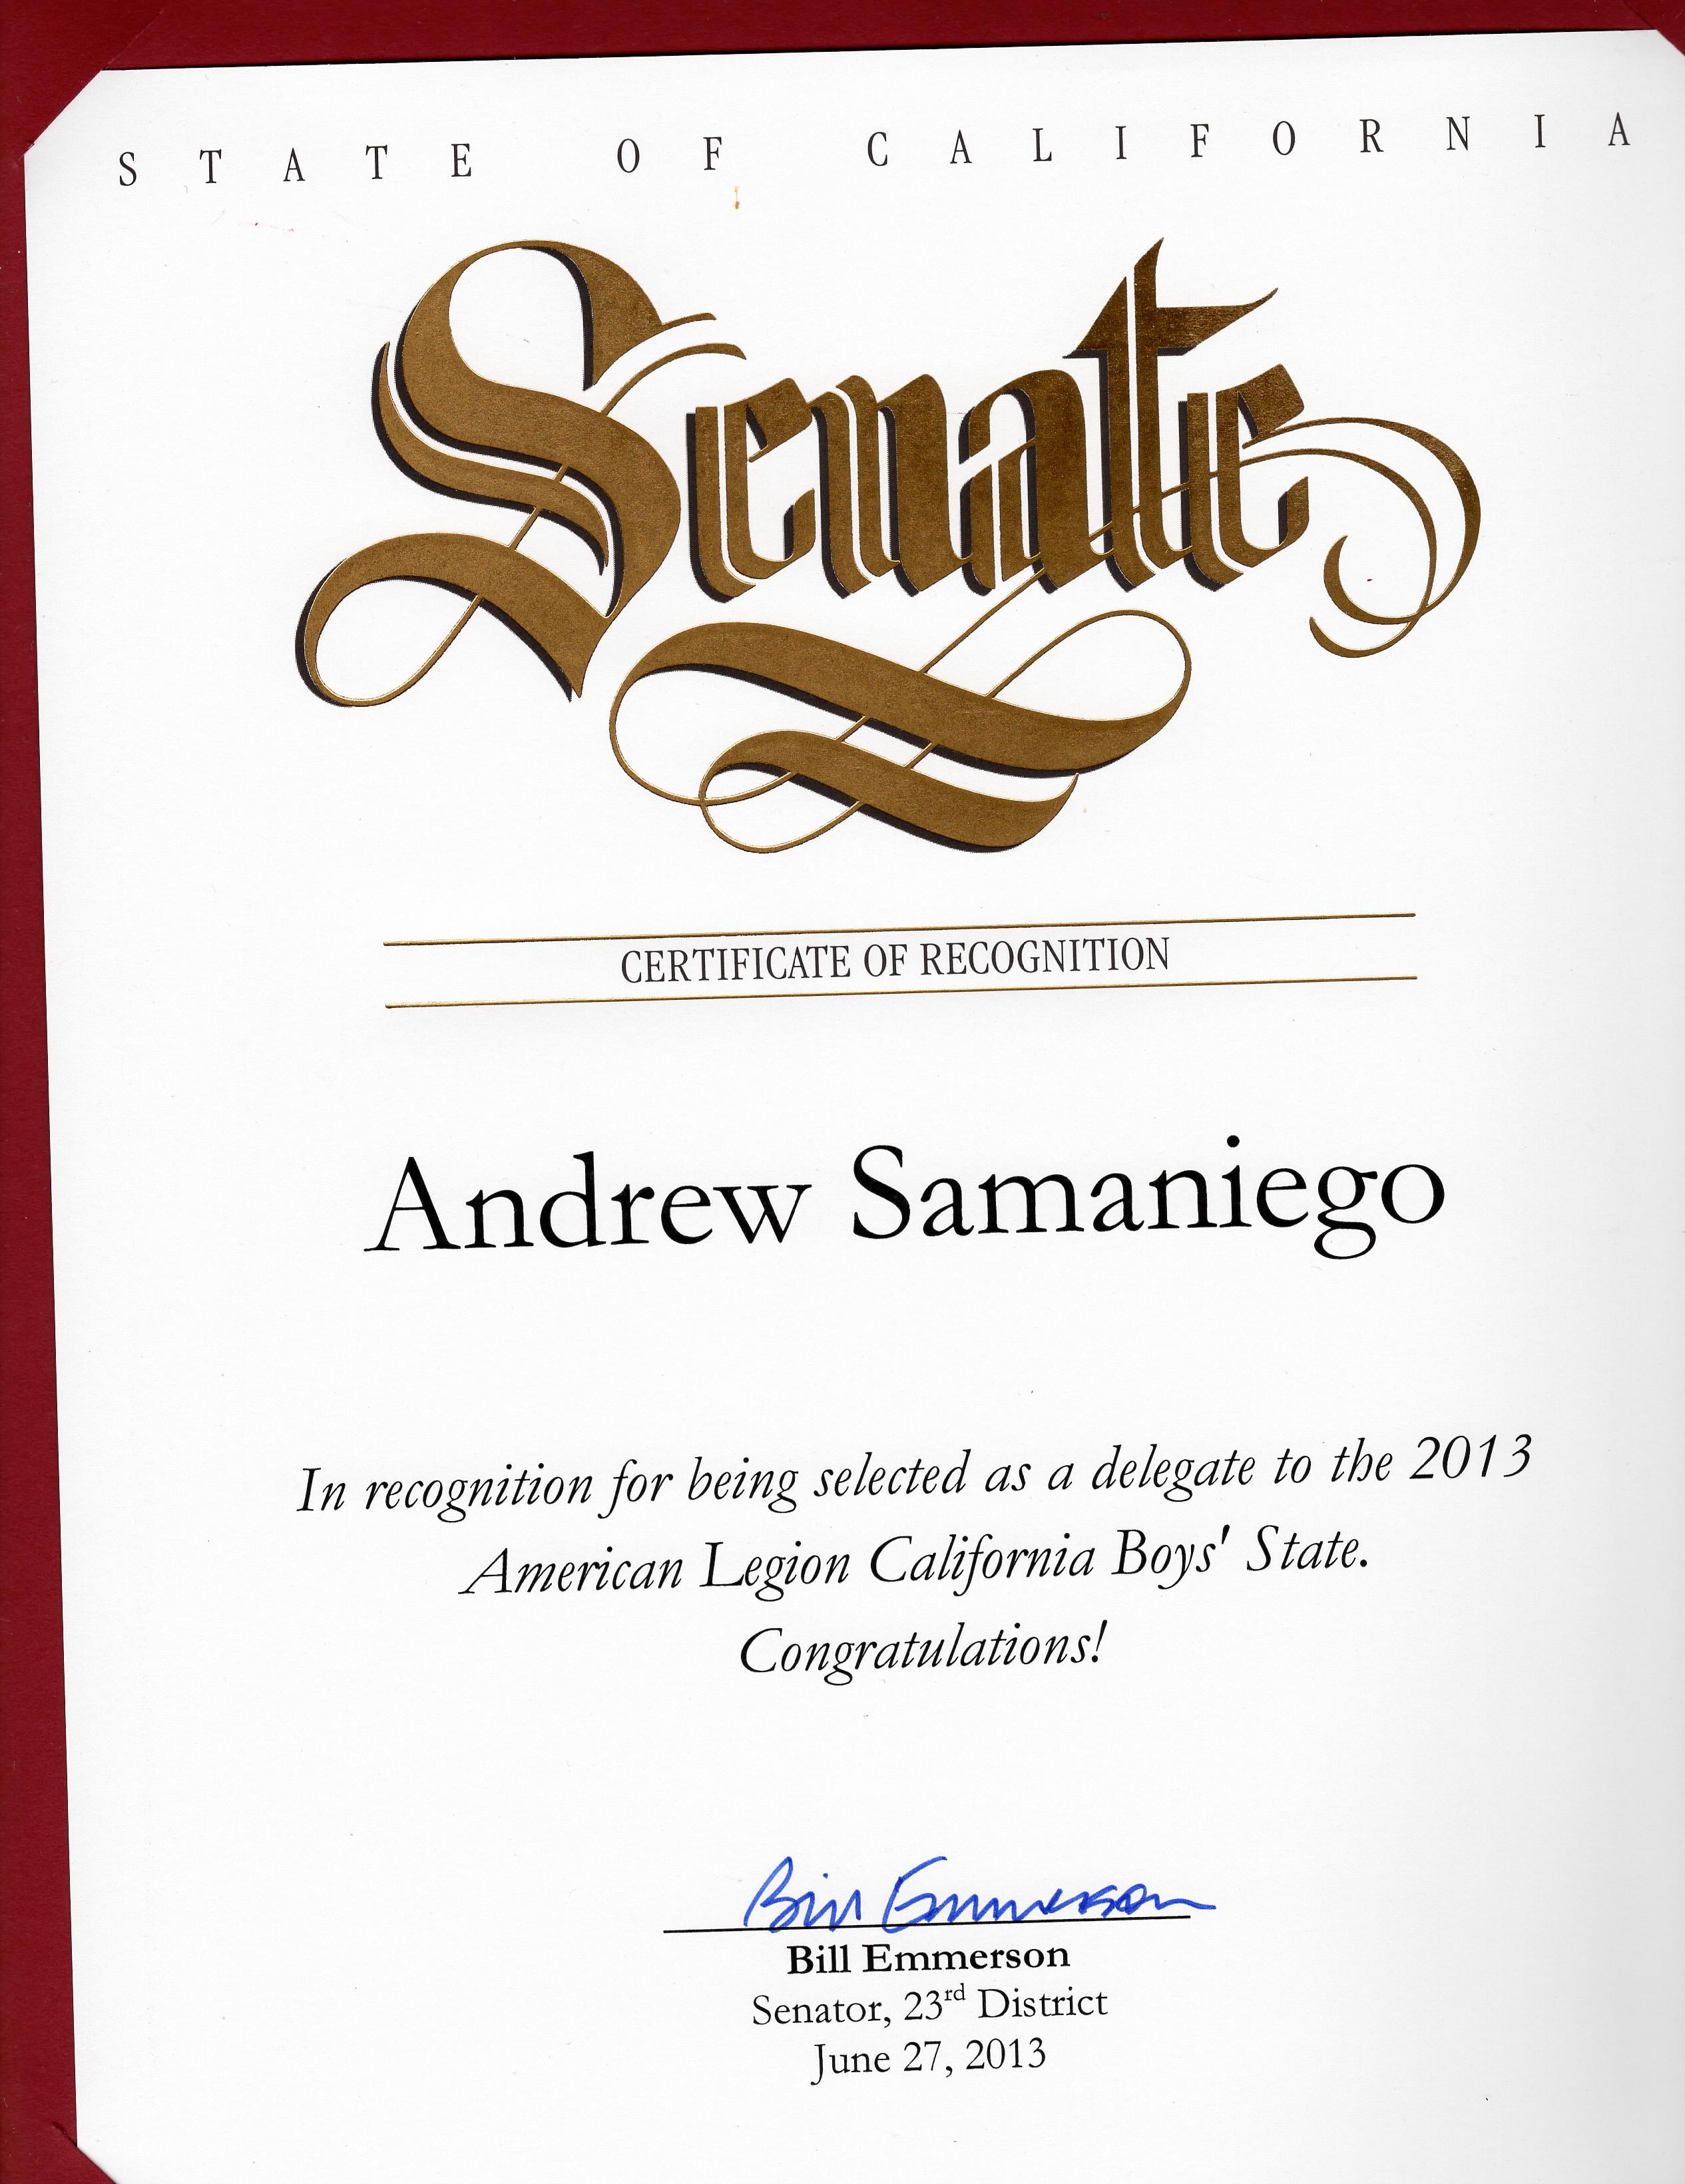 I got to meet my California Senator Emerson